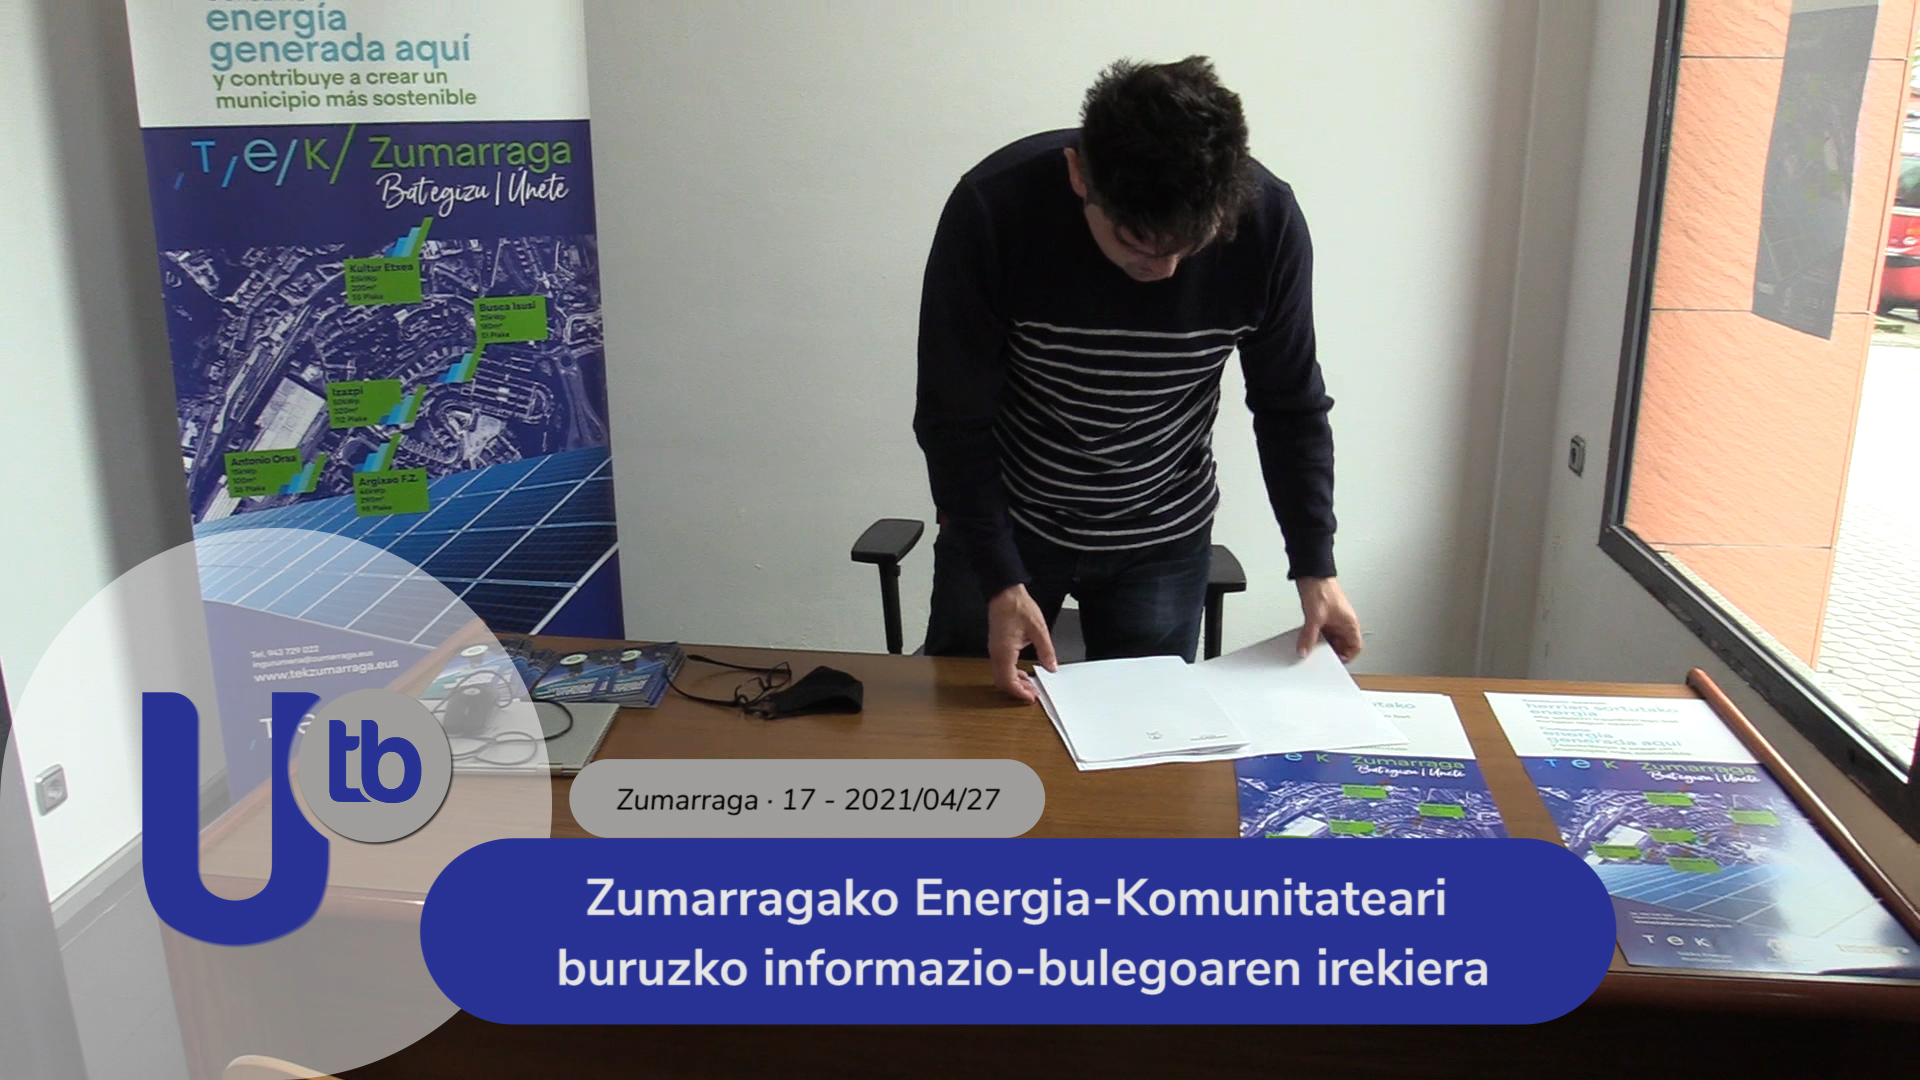 Zumarragako Energia-Komunitateari buruzko informazio-bulegoaren irekiera / Apertura de la oficina de información sobre la Comunidad Energética de Zumarraga